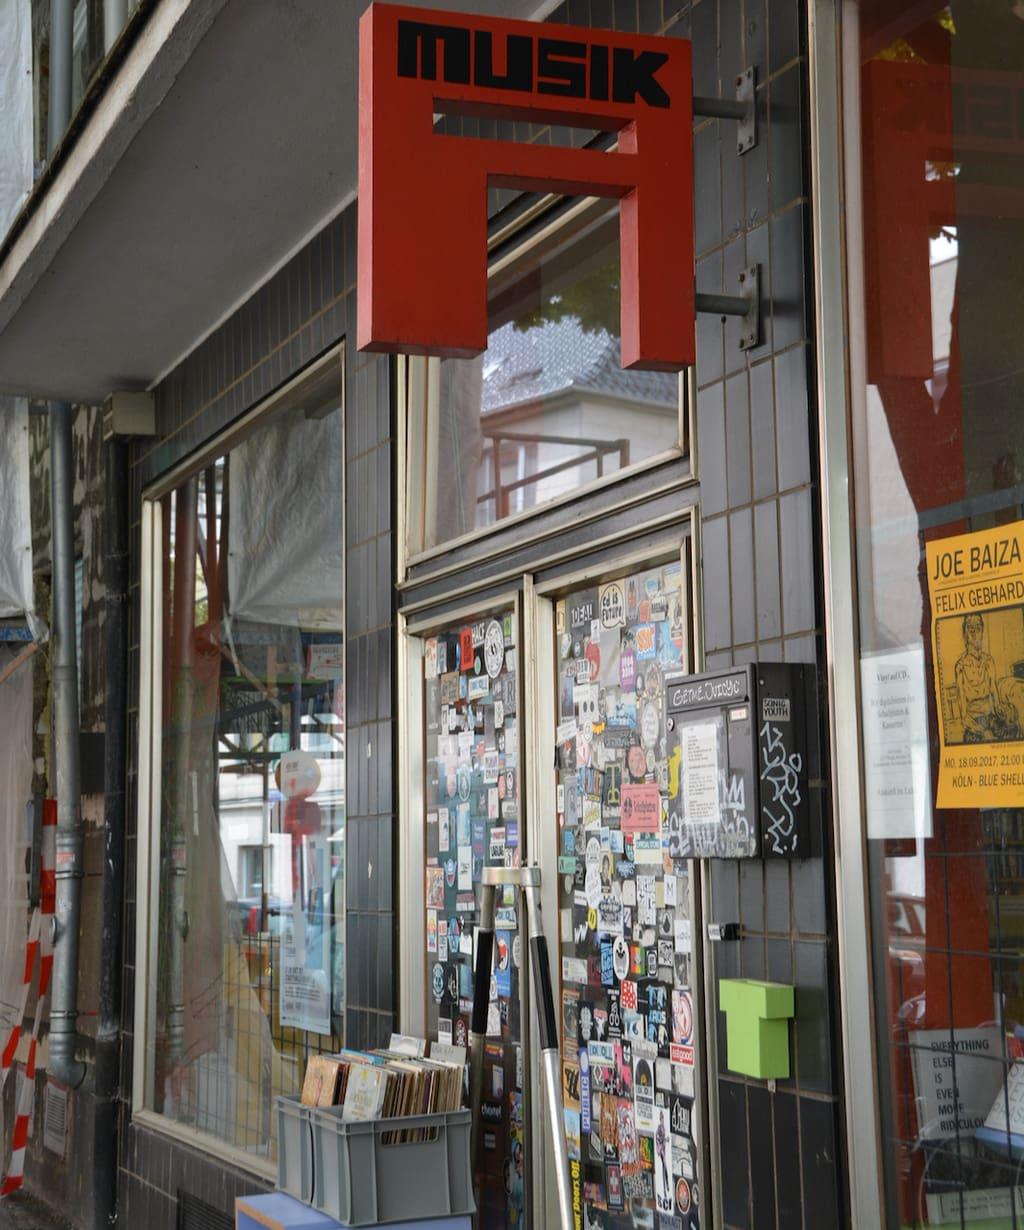 A-Musik platenwinkel in Keulen van buiten